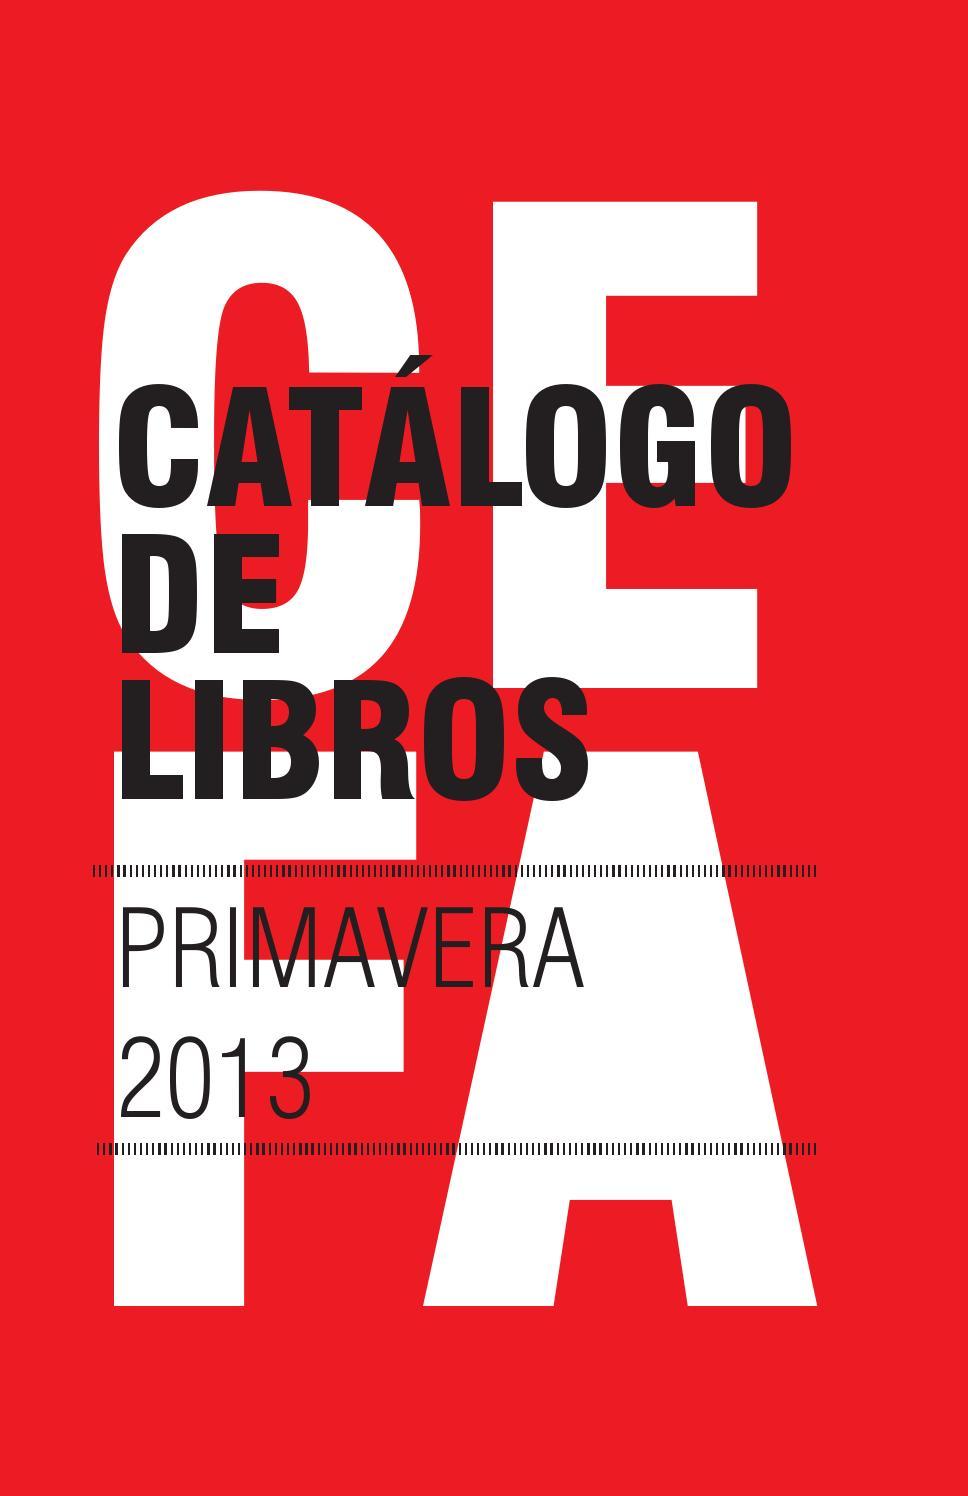 Cat logo de la facultad de arquitectura unam by editorial for Catalogo arquitectura